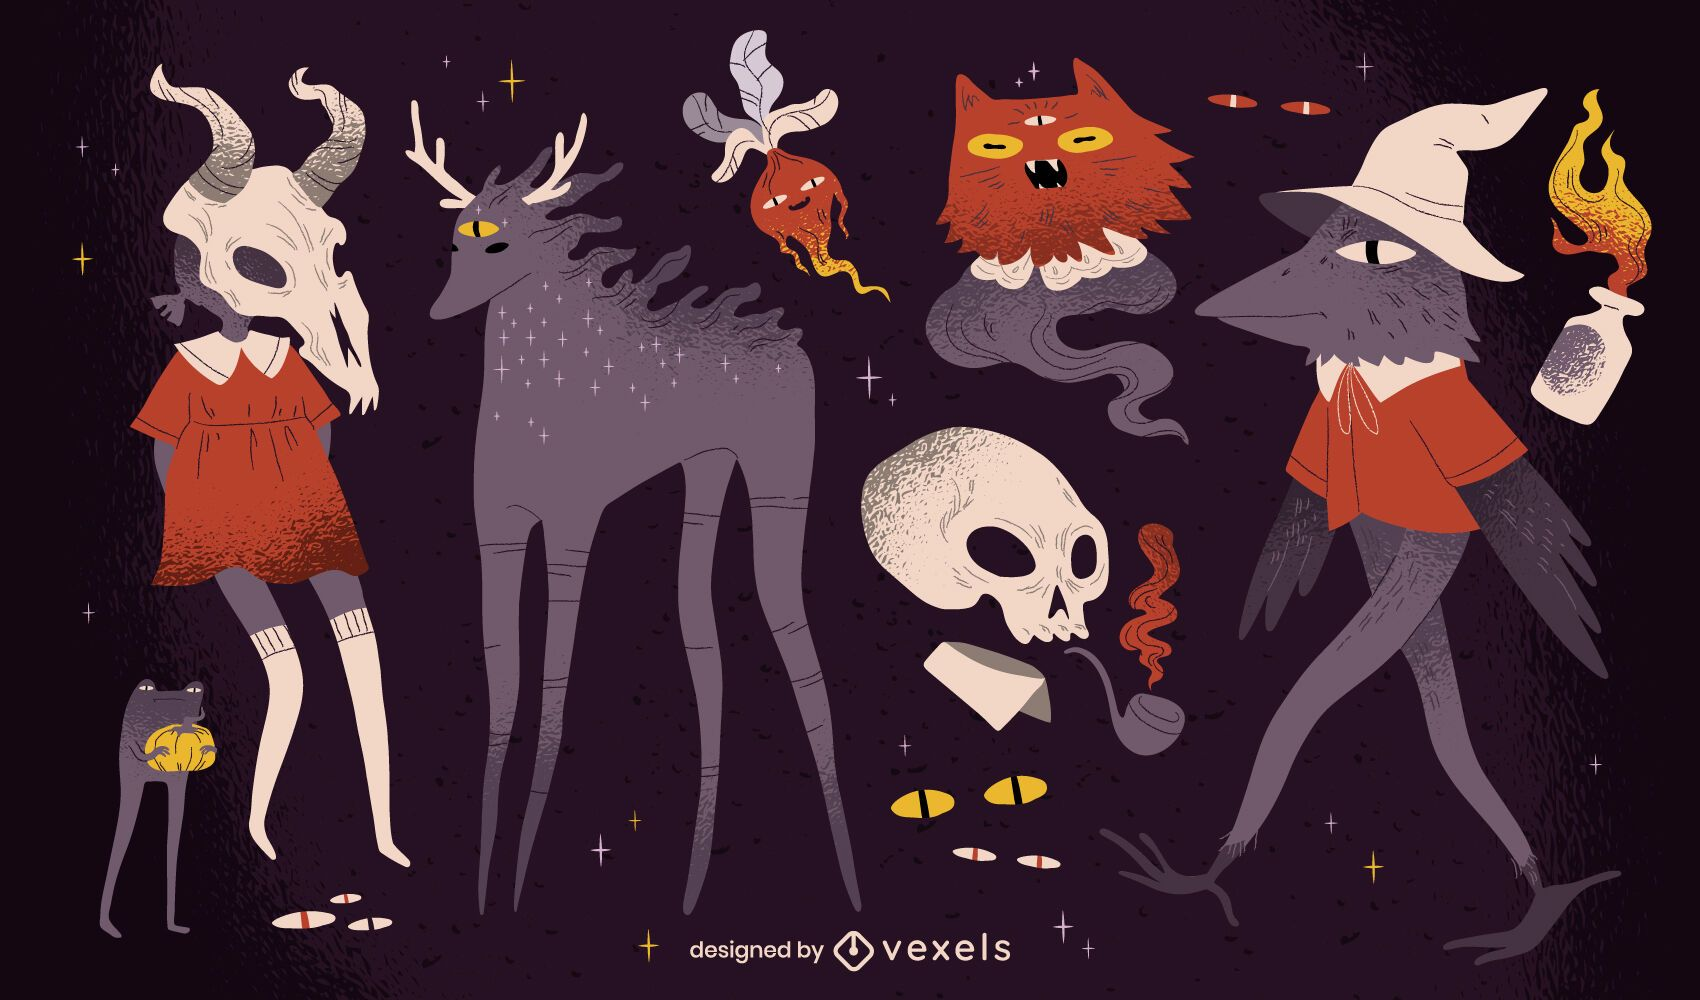 Paquete de criaturas espeluznantes de Halloween